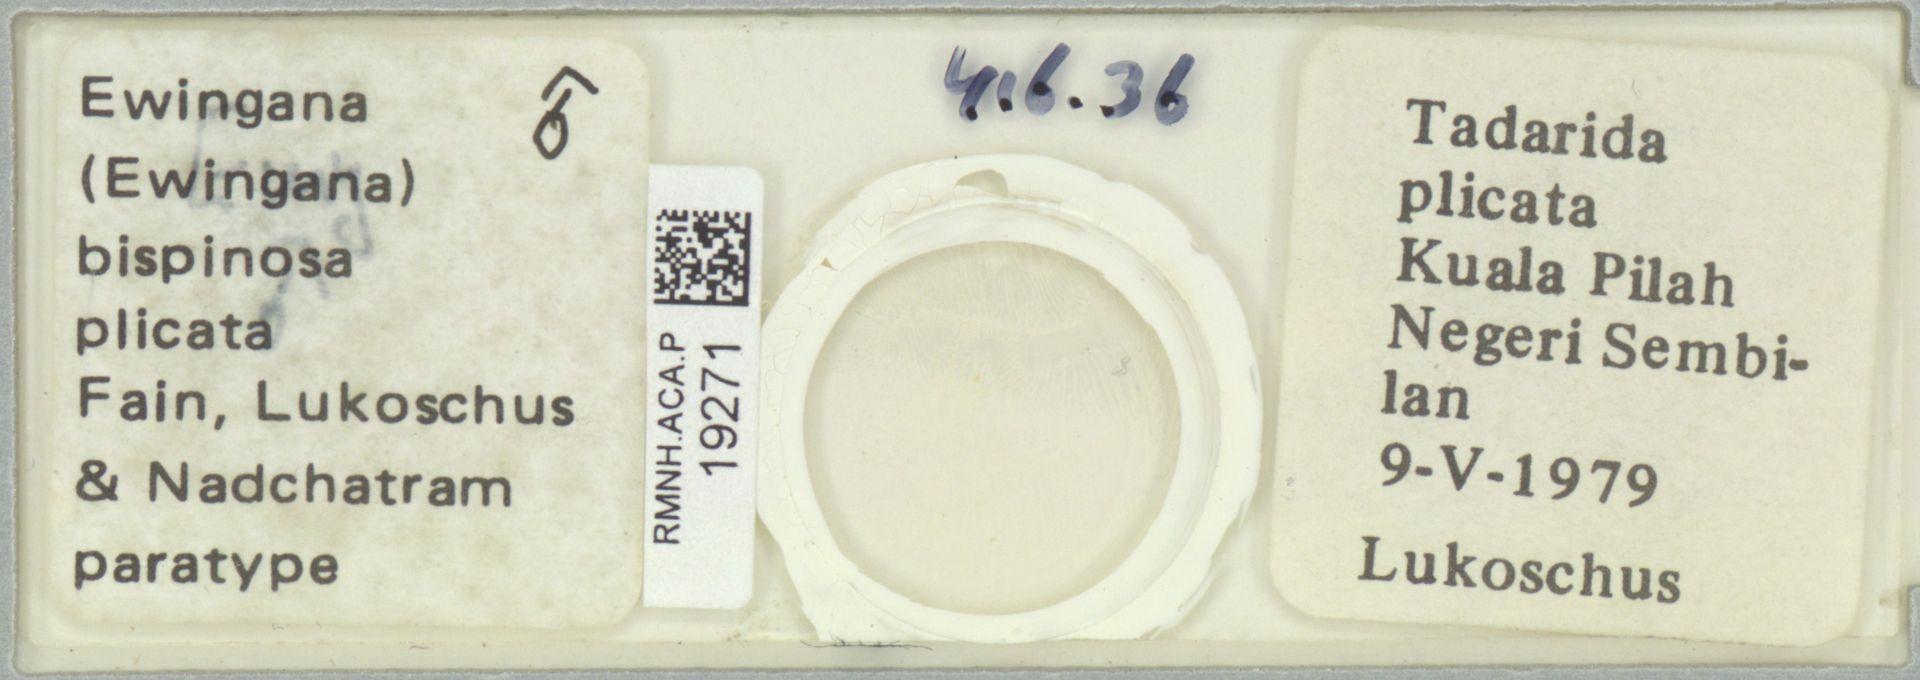 RMNH.ACA.P.19271 | Ewingana (Ewingana) bispinosa plicata Fain, Lukoschus & Nadchatram